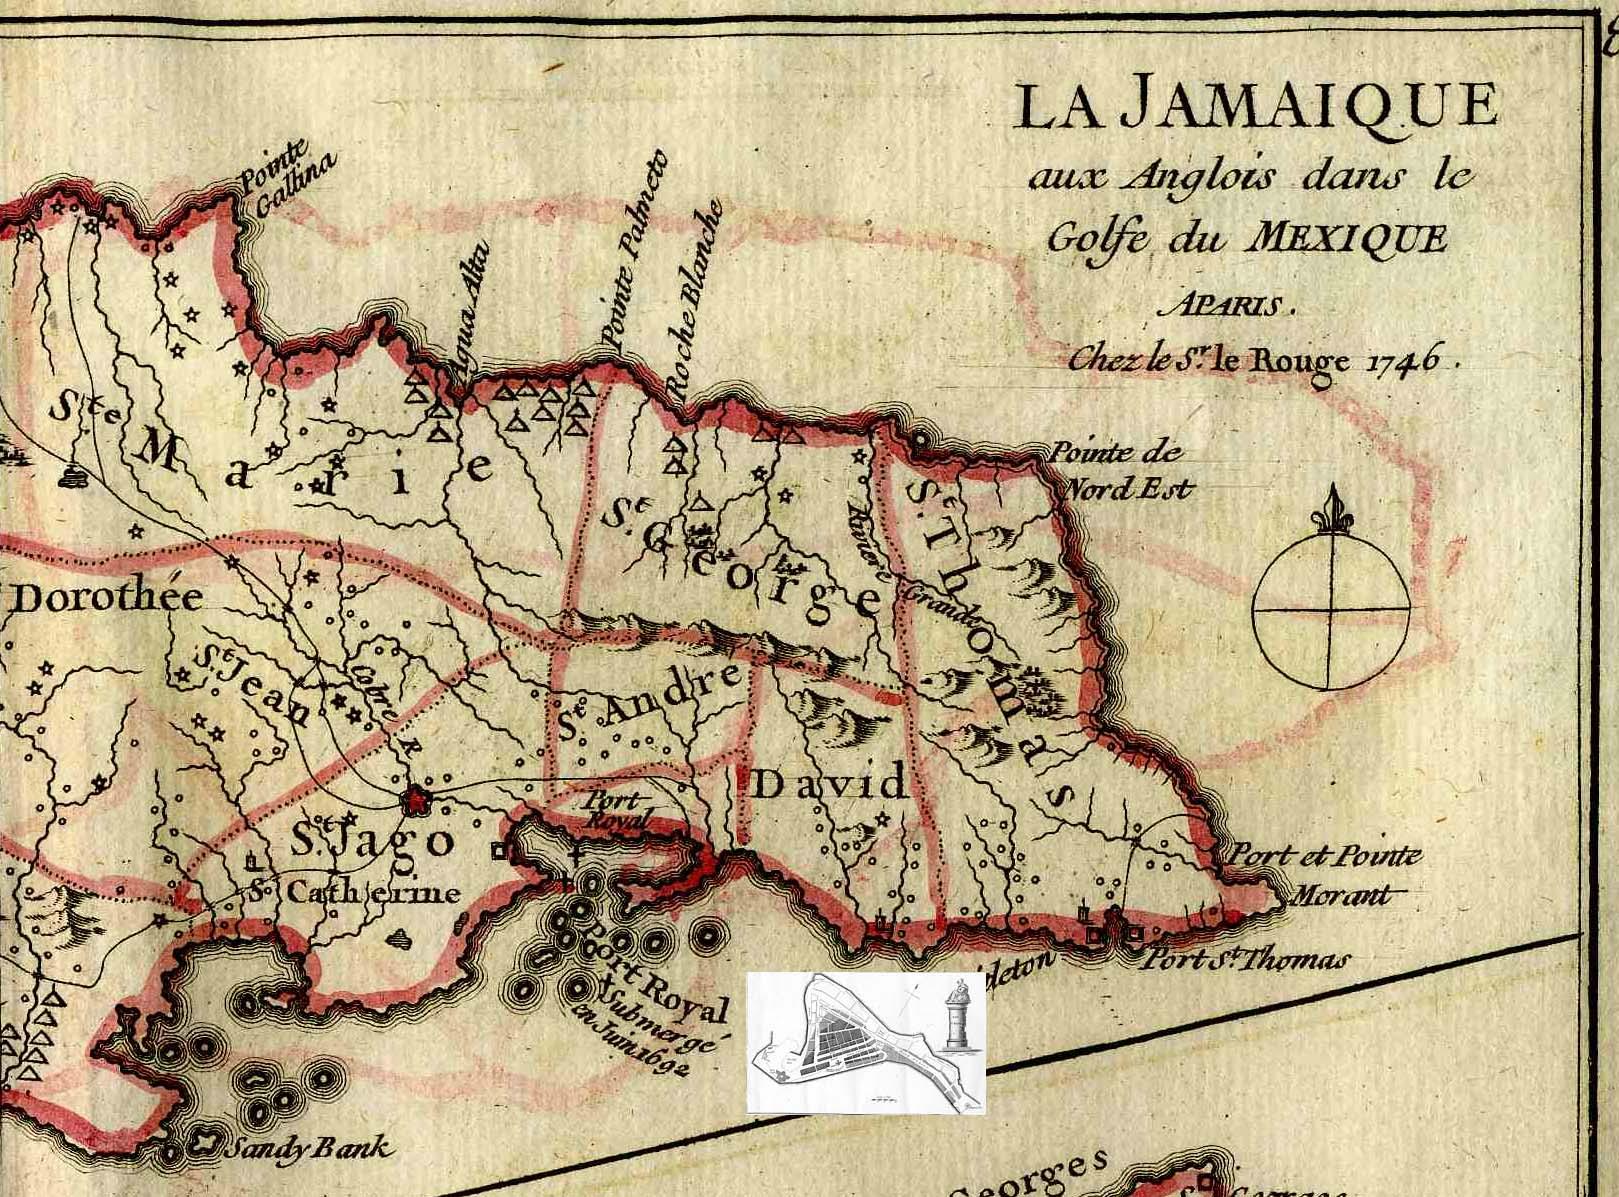 Year 16932